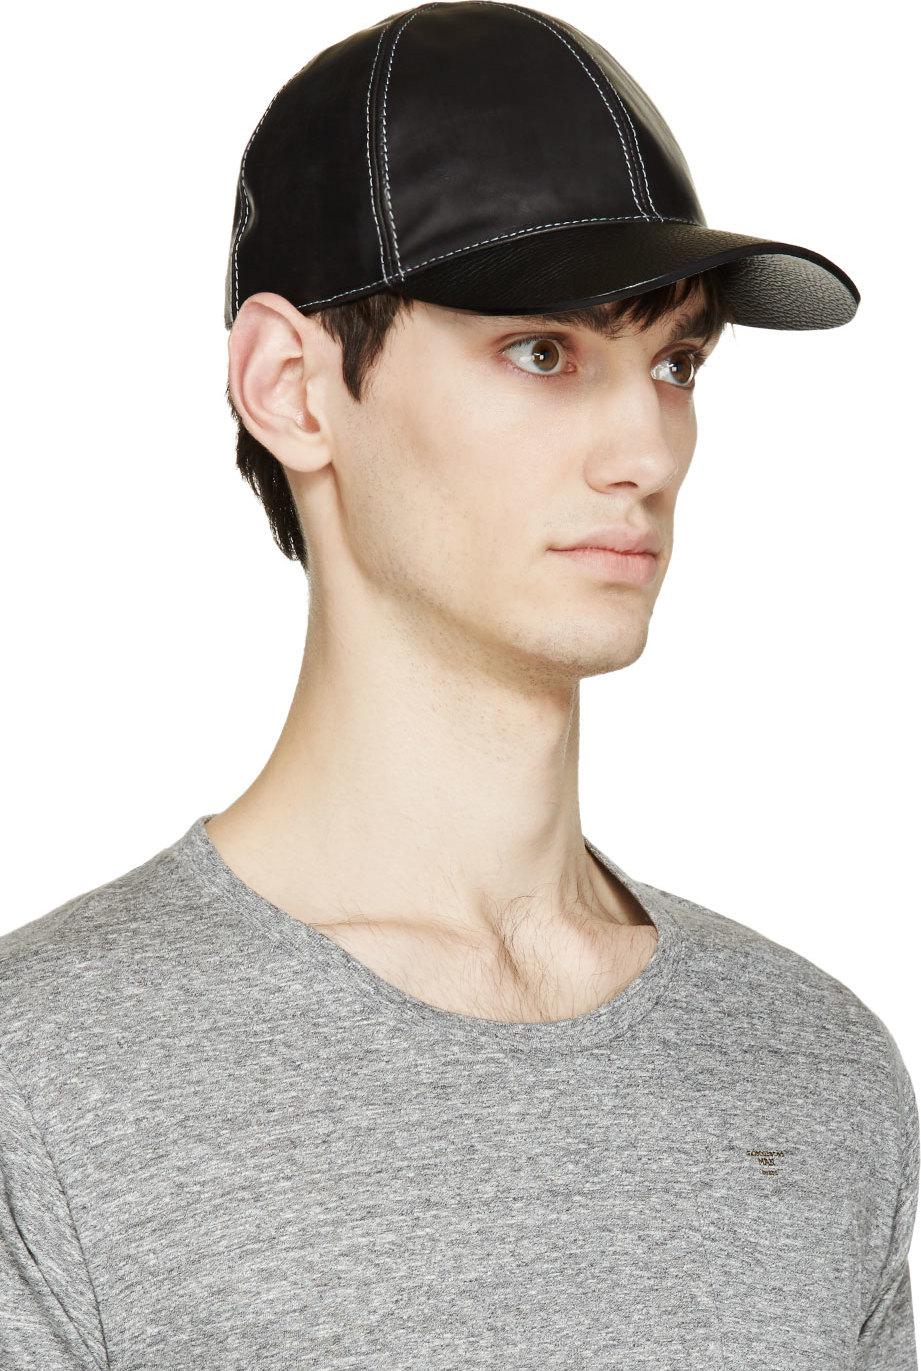 4535db4f370 Lyst - Marc Jacobs Black Leather Baseball Cap in Black for Men